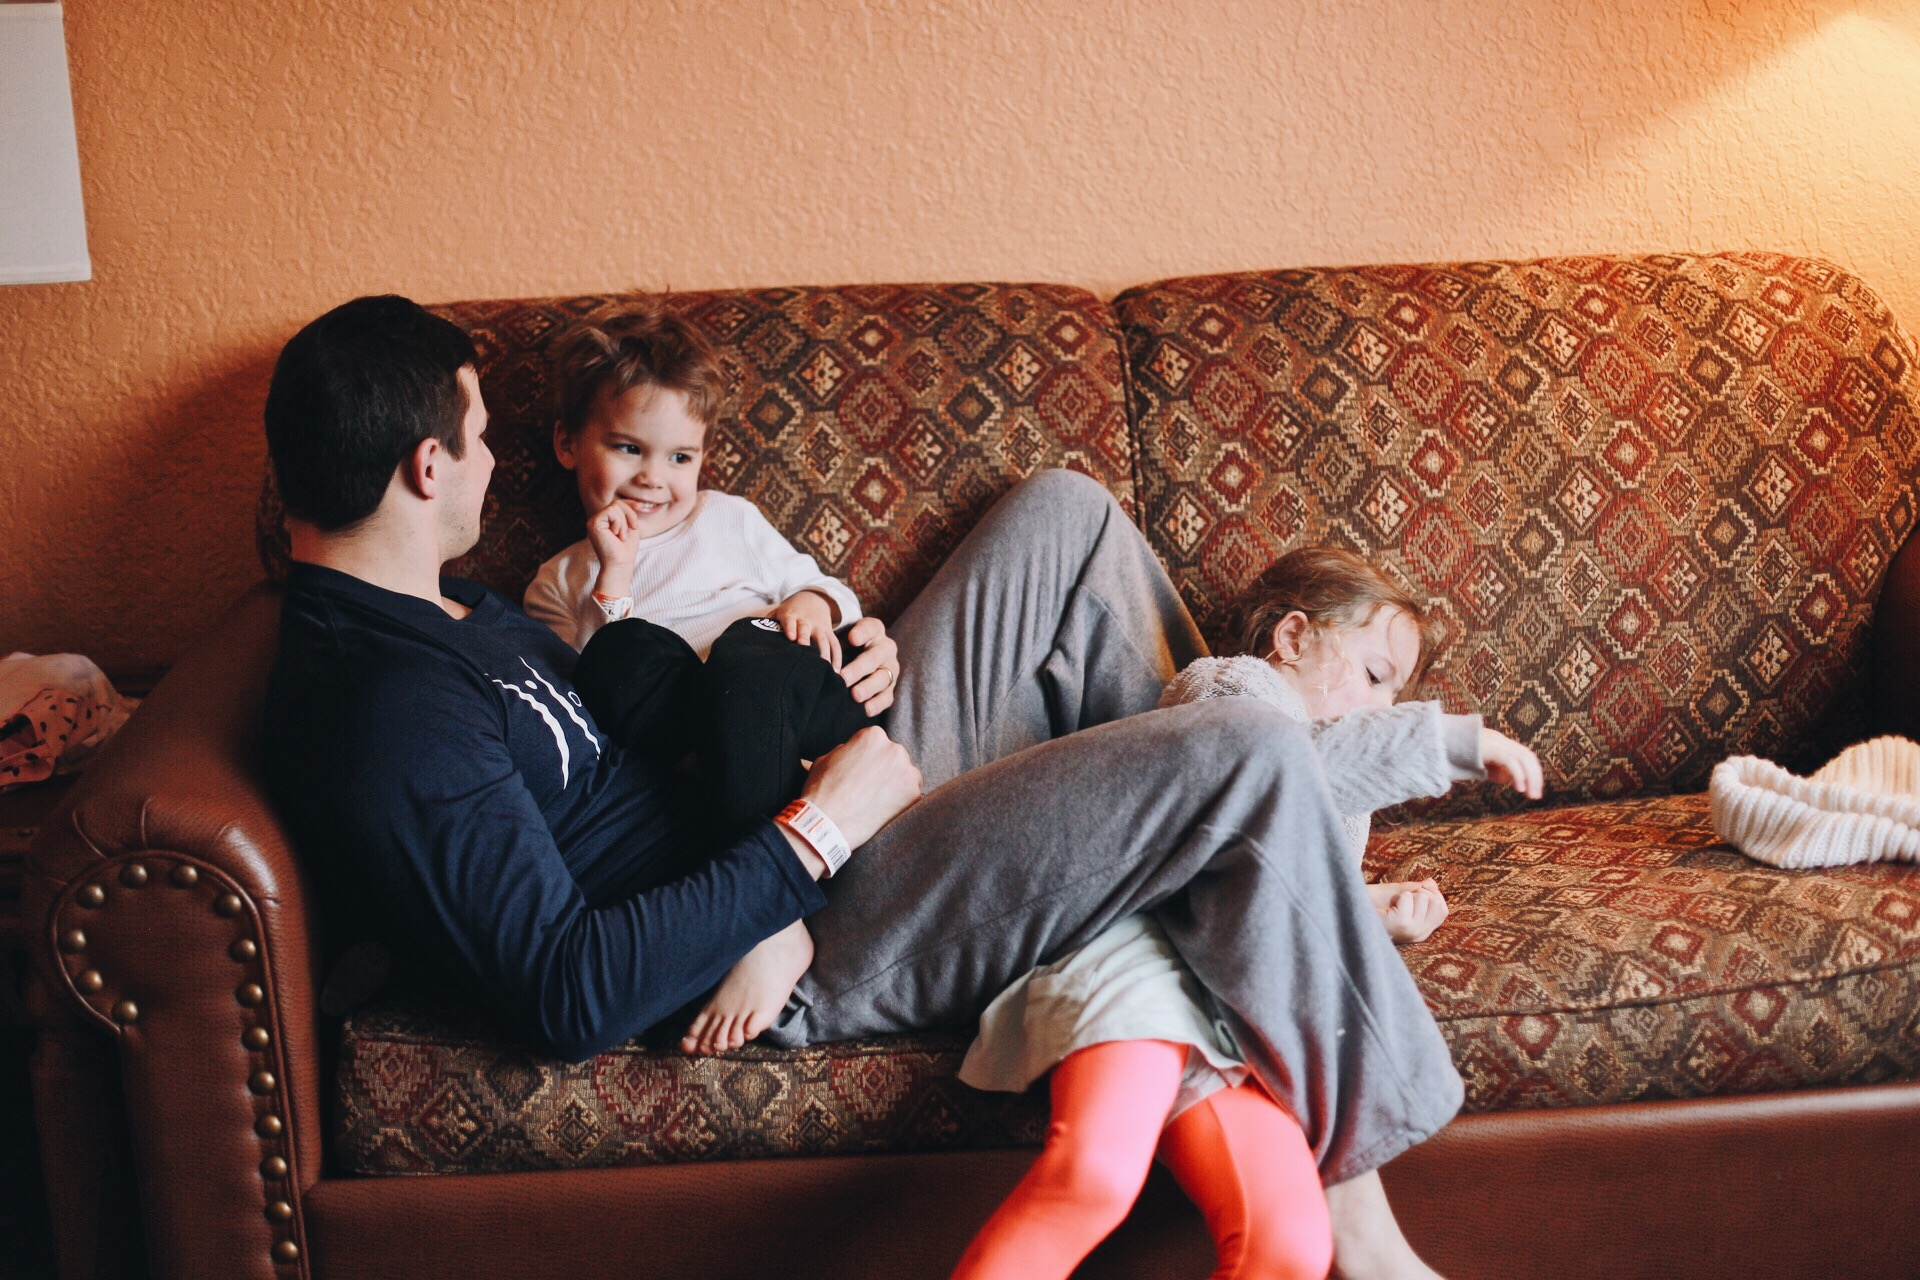 Wisconsin Dells Family Vacation